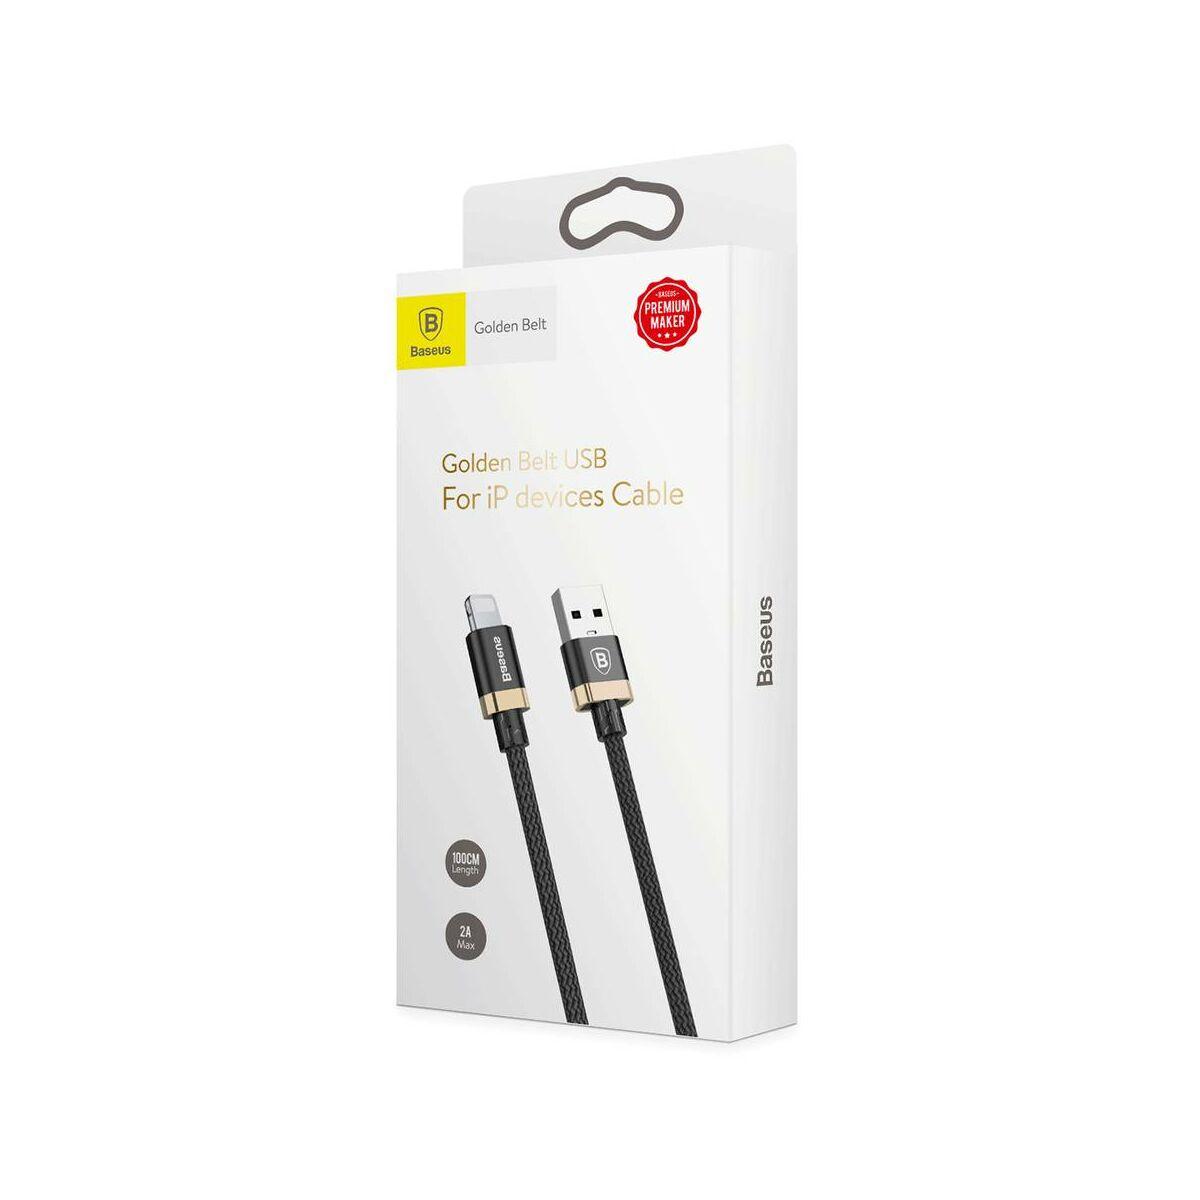 Baseus Lightning kábel, Golden Belt Series prémium 1.5m, fekete/arany (CALGB-A1V)